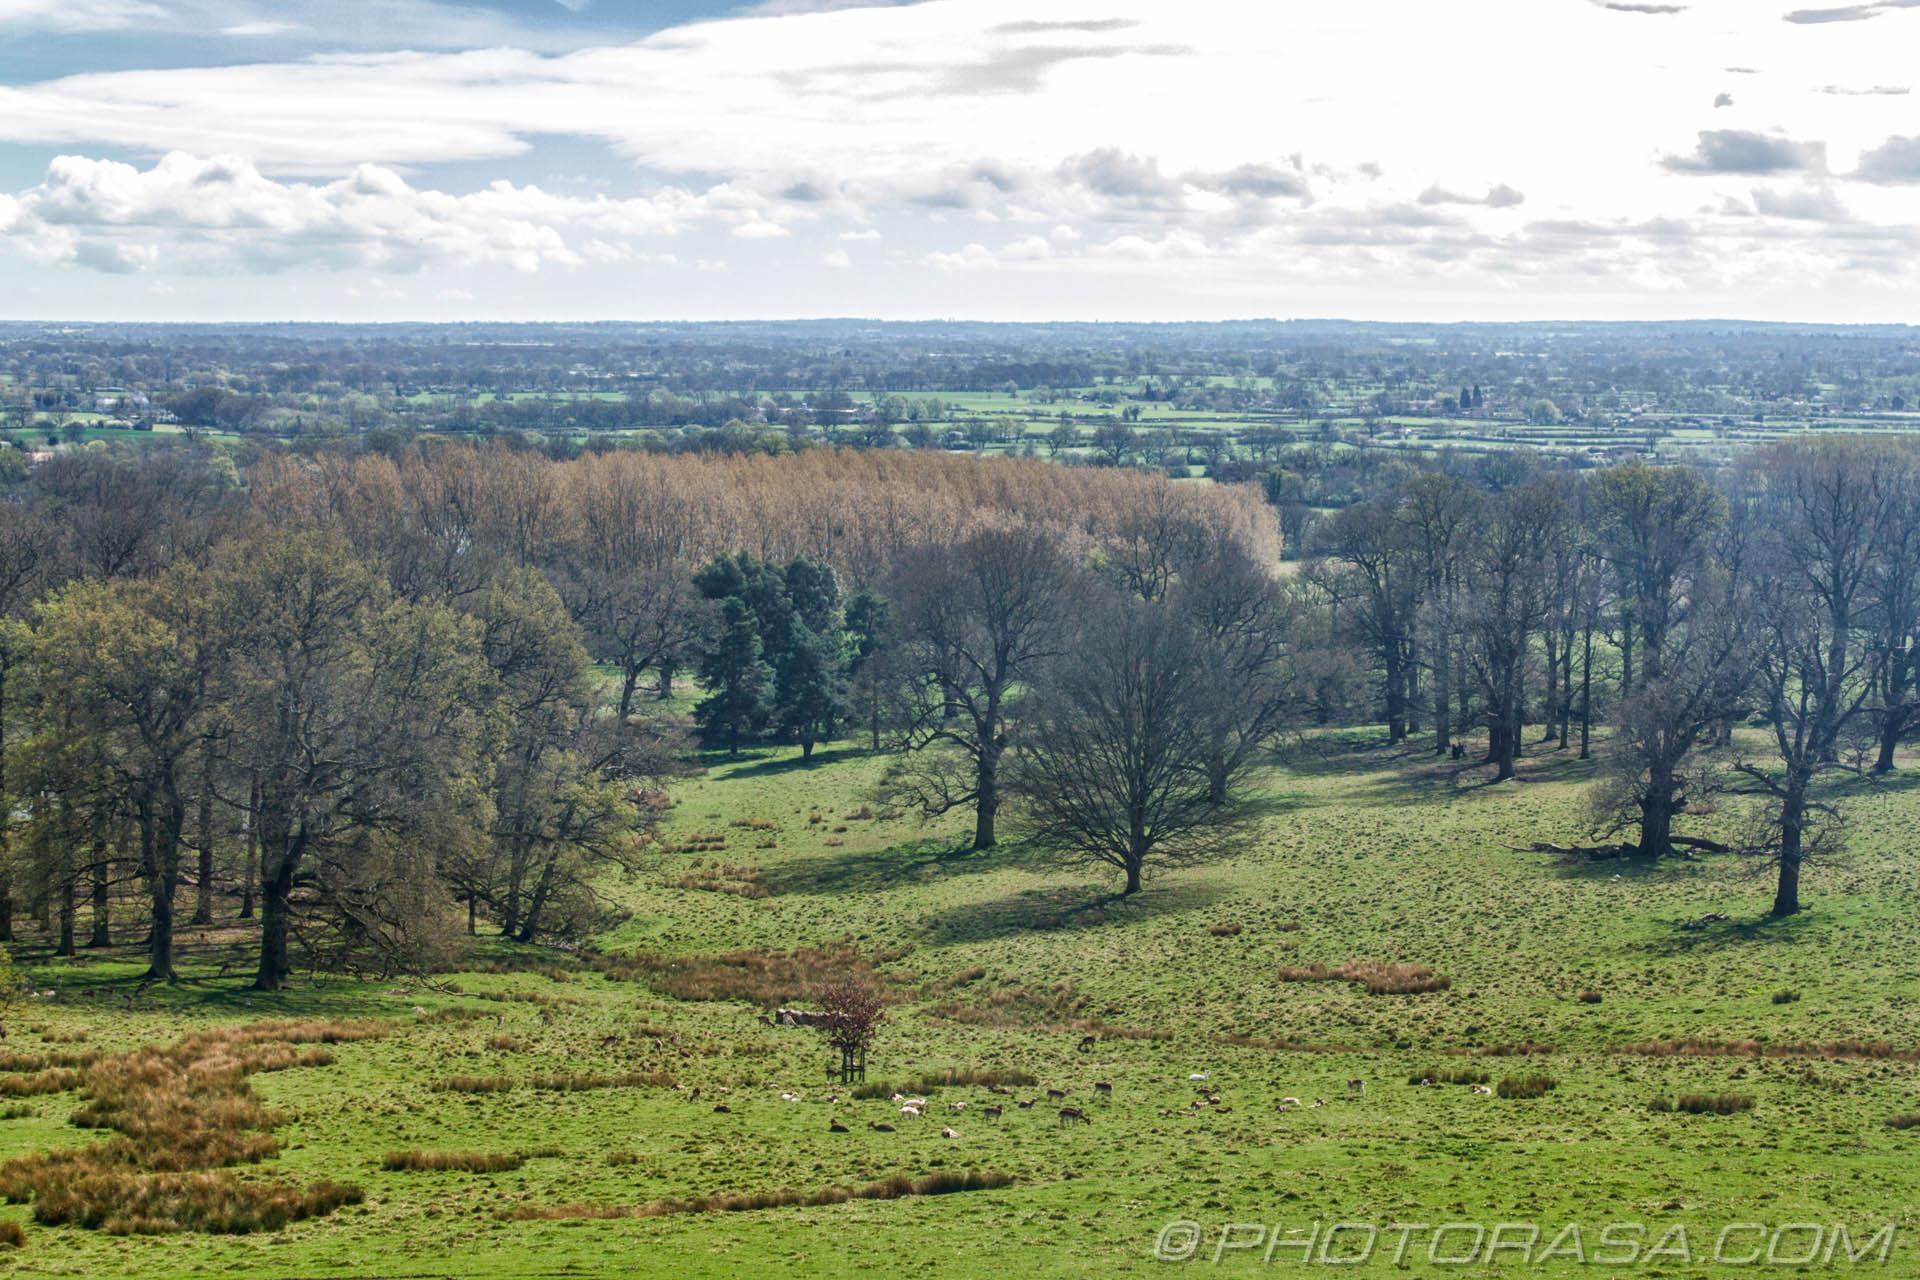 https://photorasa.com/view-boughton-monchelsea-churchyard/view-to-sutton-valence/